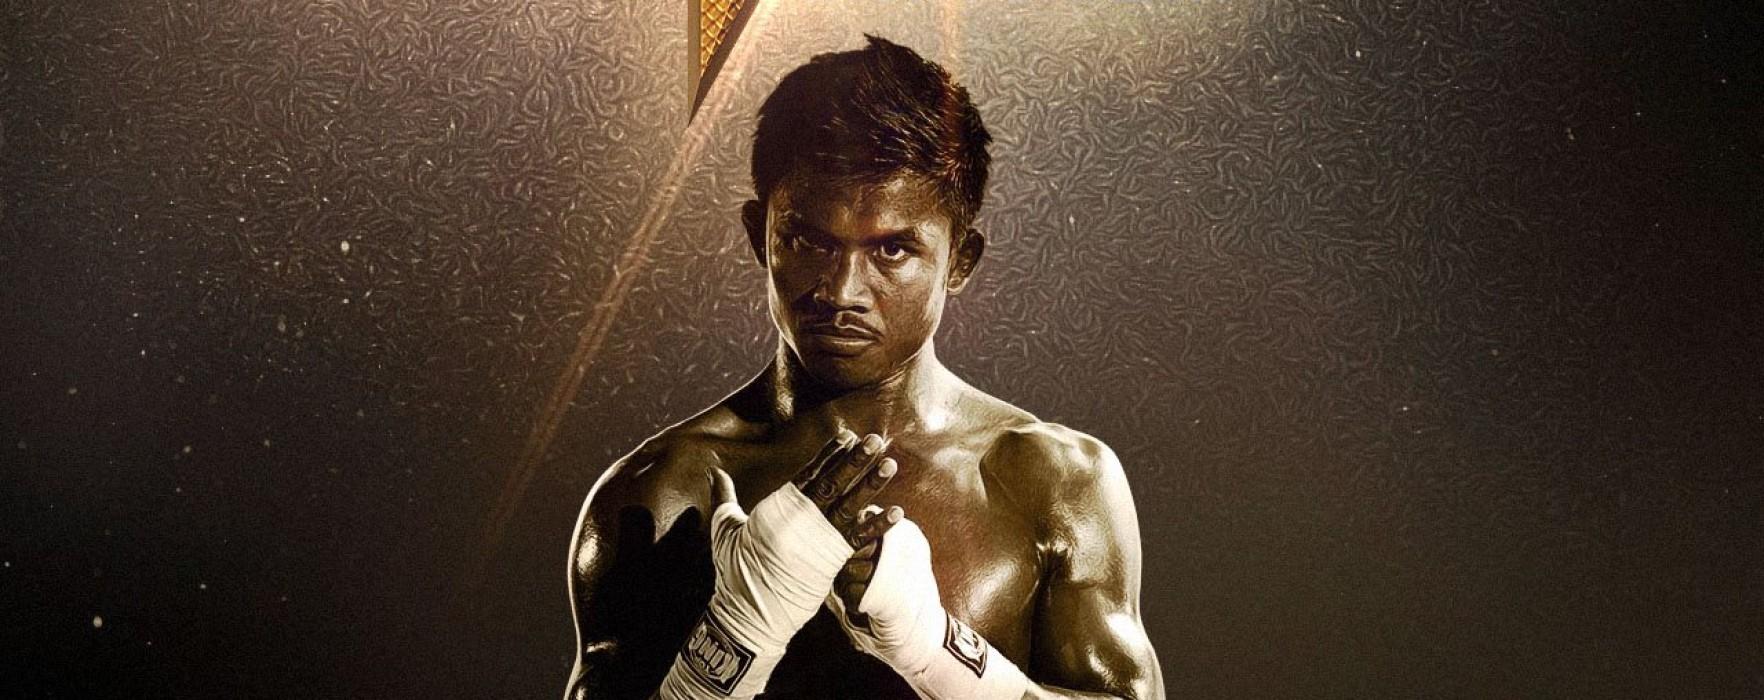 Max Muay Thai – Videos & Results 29-06-2013